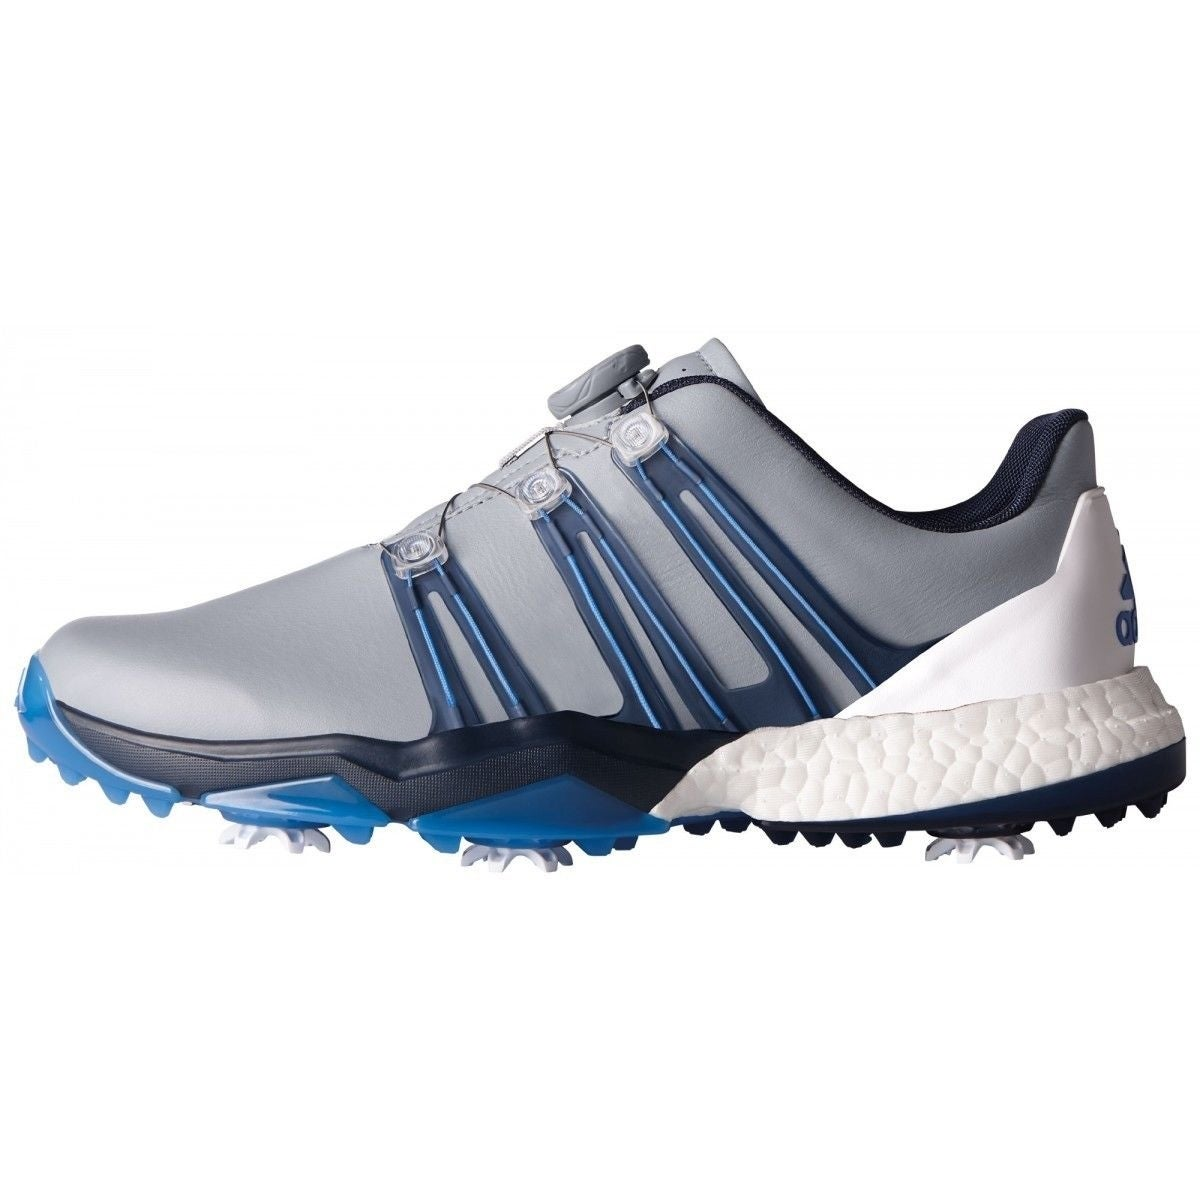 8068100300a Adidas Golf Shoes